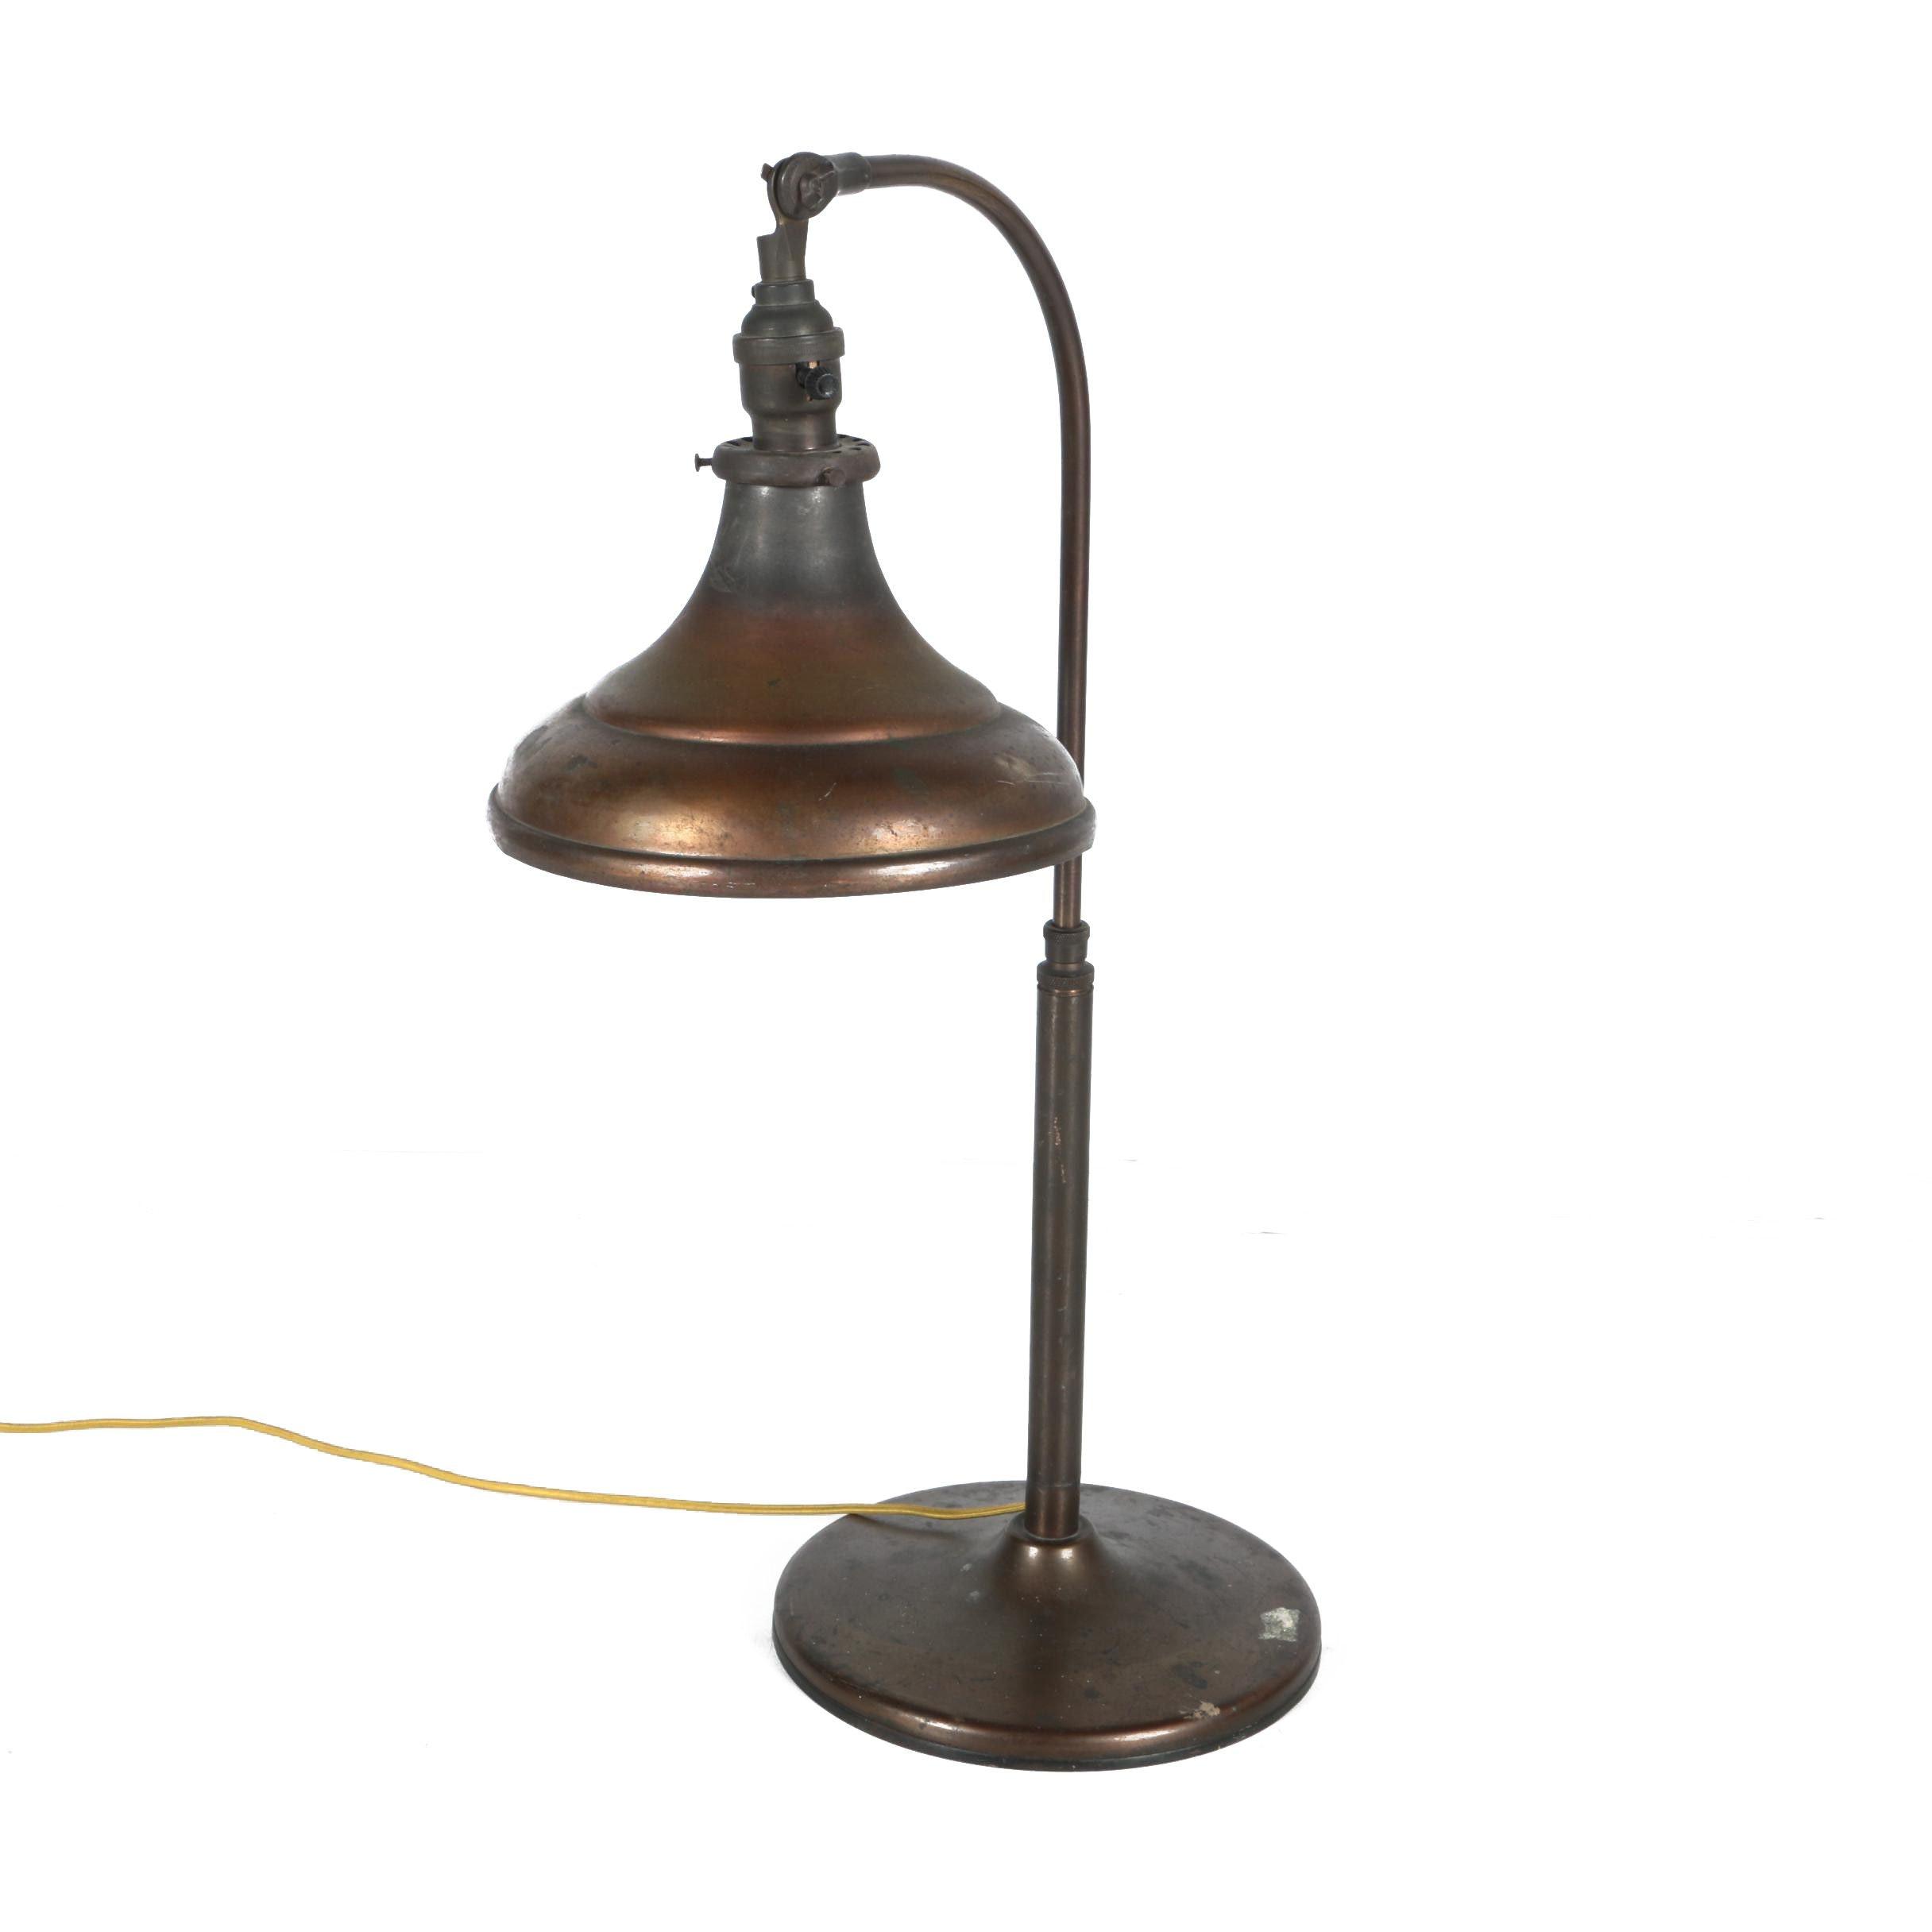 Vintage O.C. White Co. Copper Desk Lamp